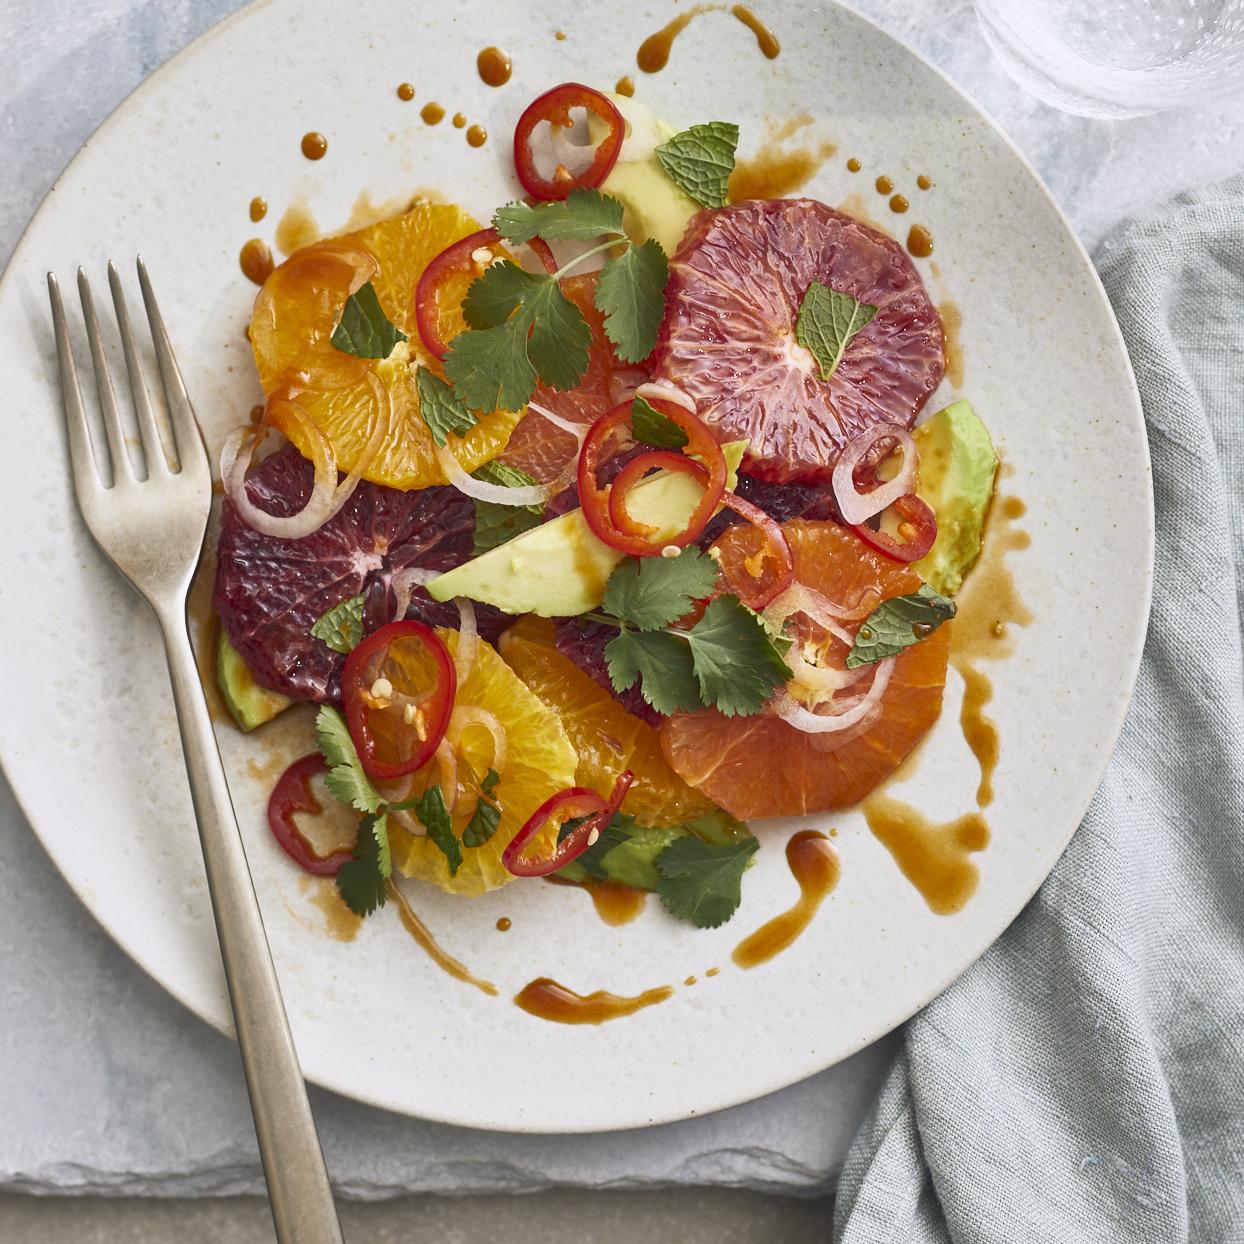 Feel-Good Fruit Salad Trusted Brands